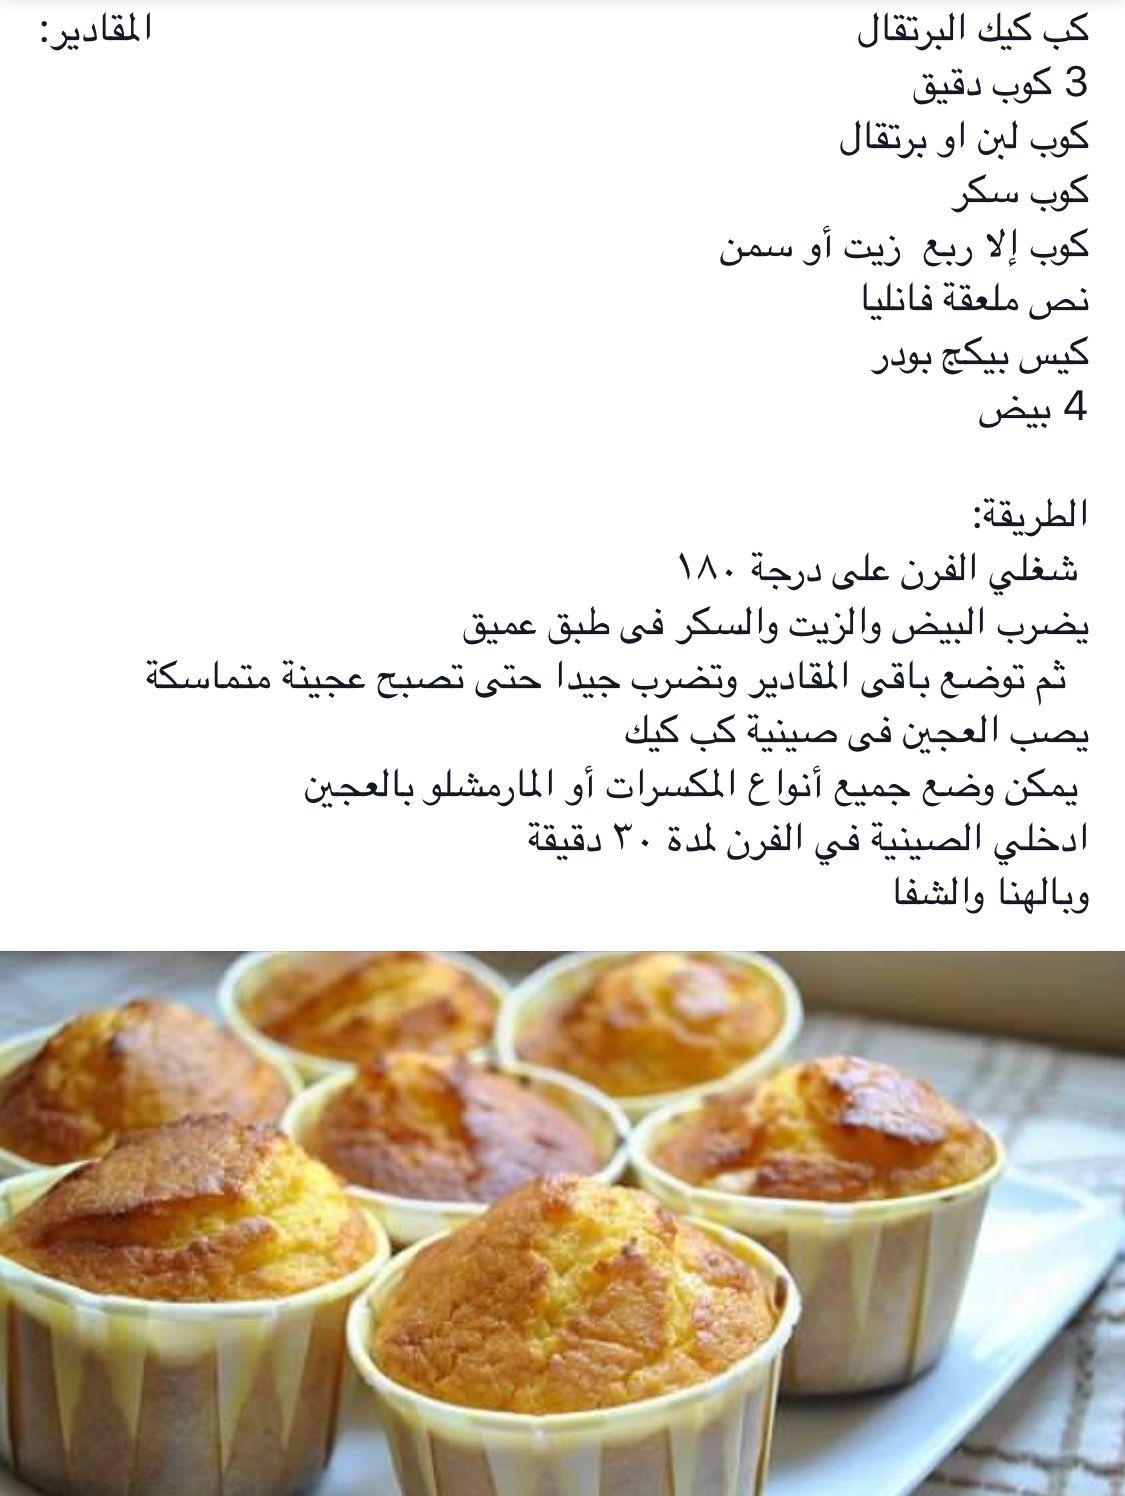 كب كيك برتقال Arabic Sweets Recipes Food Arabic Food